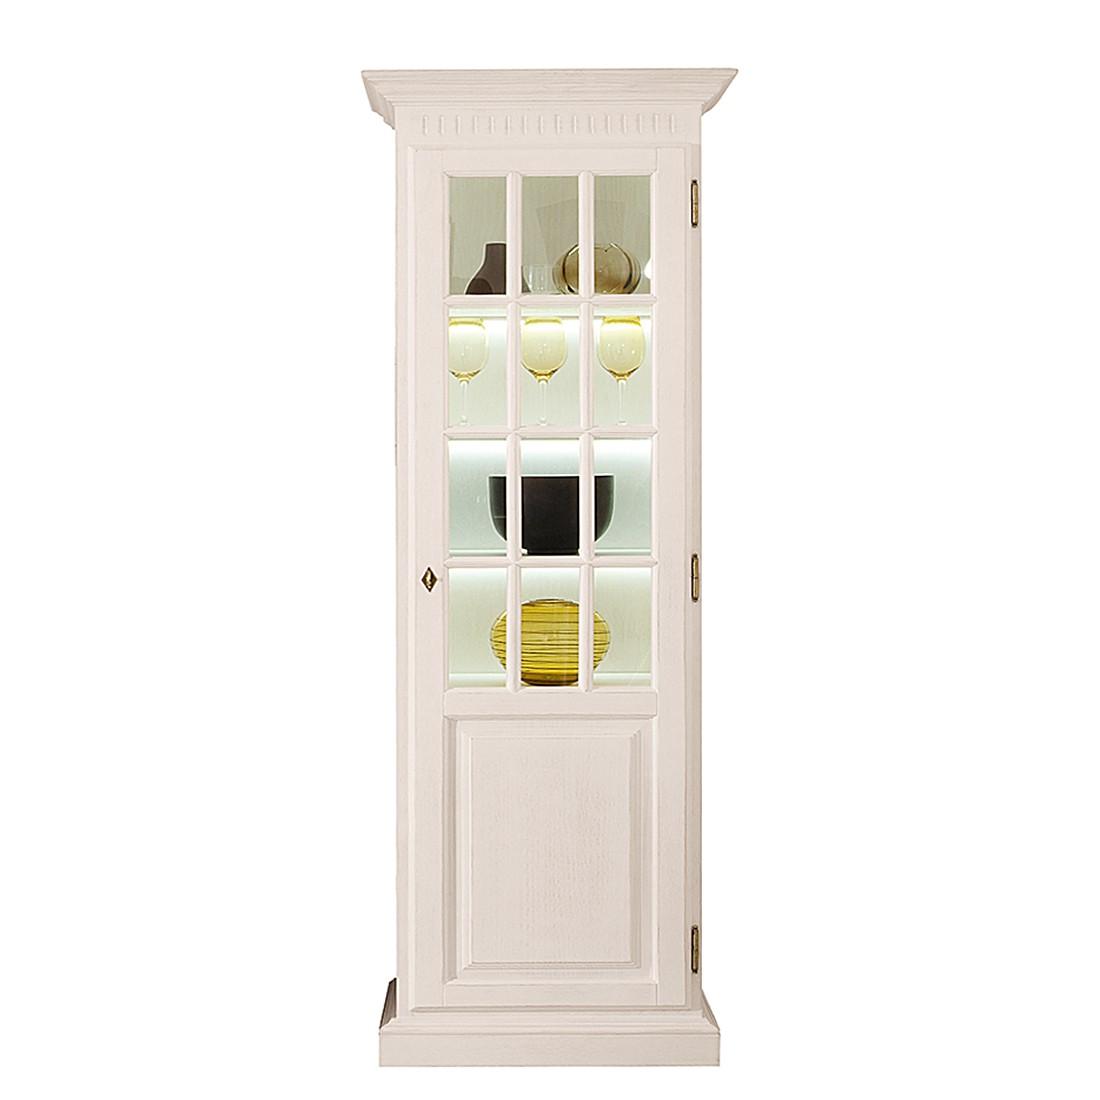 EEK A+, Armoire vitrine La Carlotta II - Pin massif - Crème - Avec éclairage, Ridgevalley